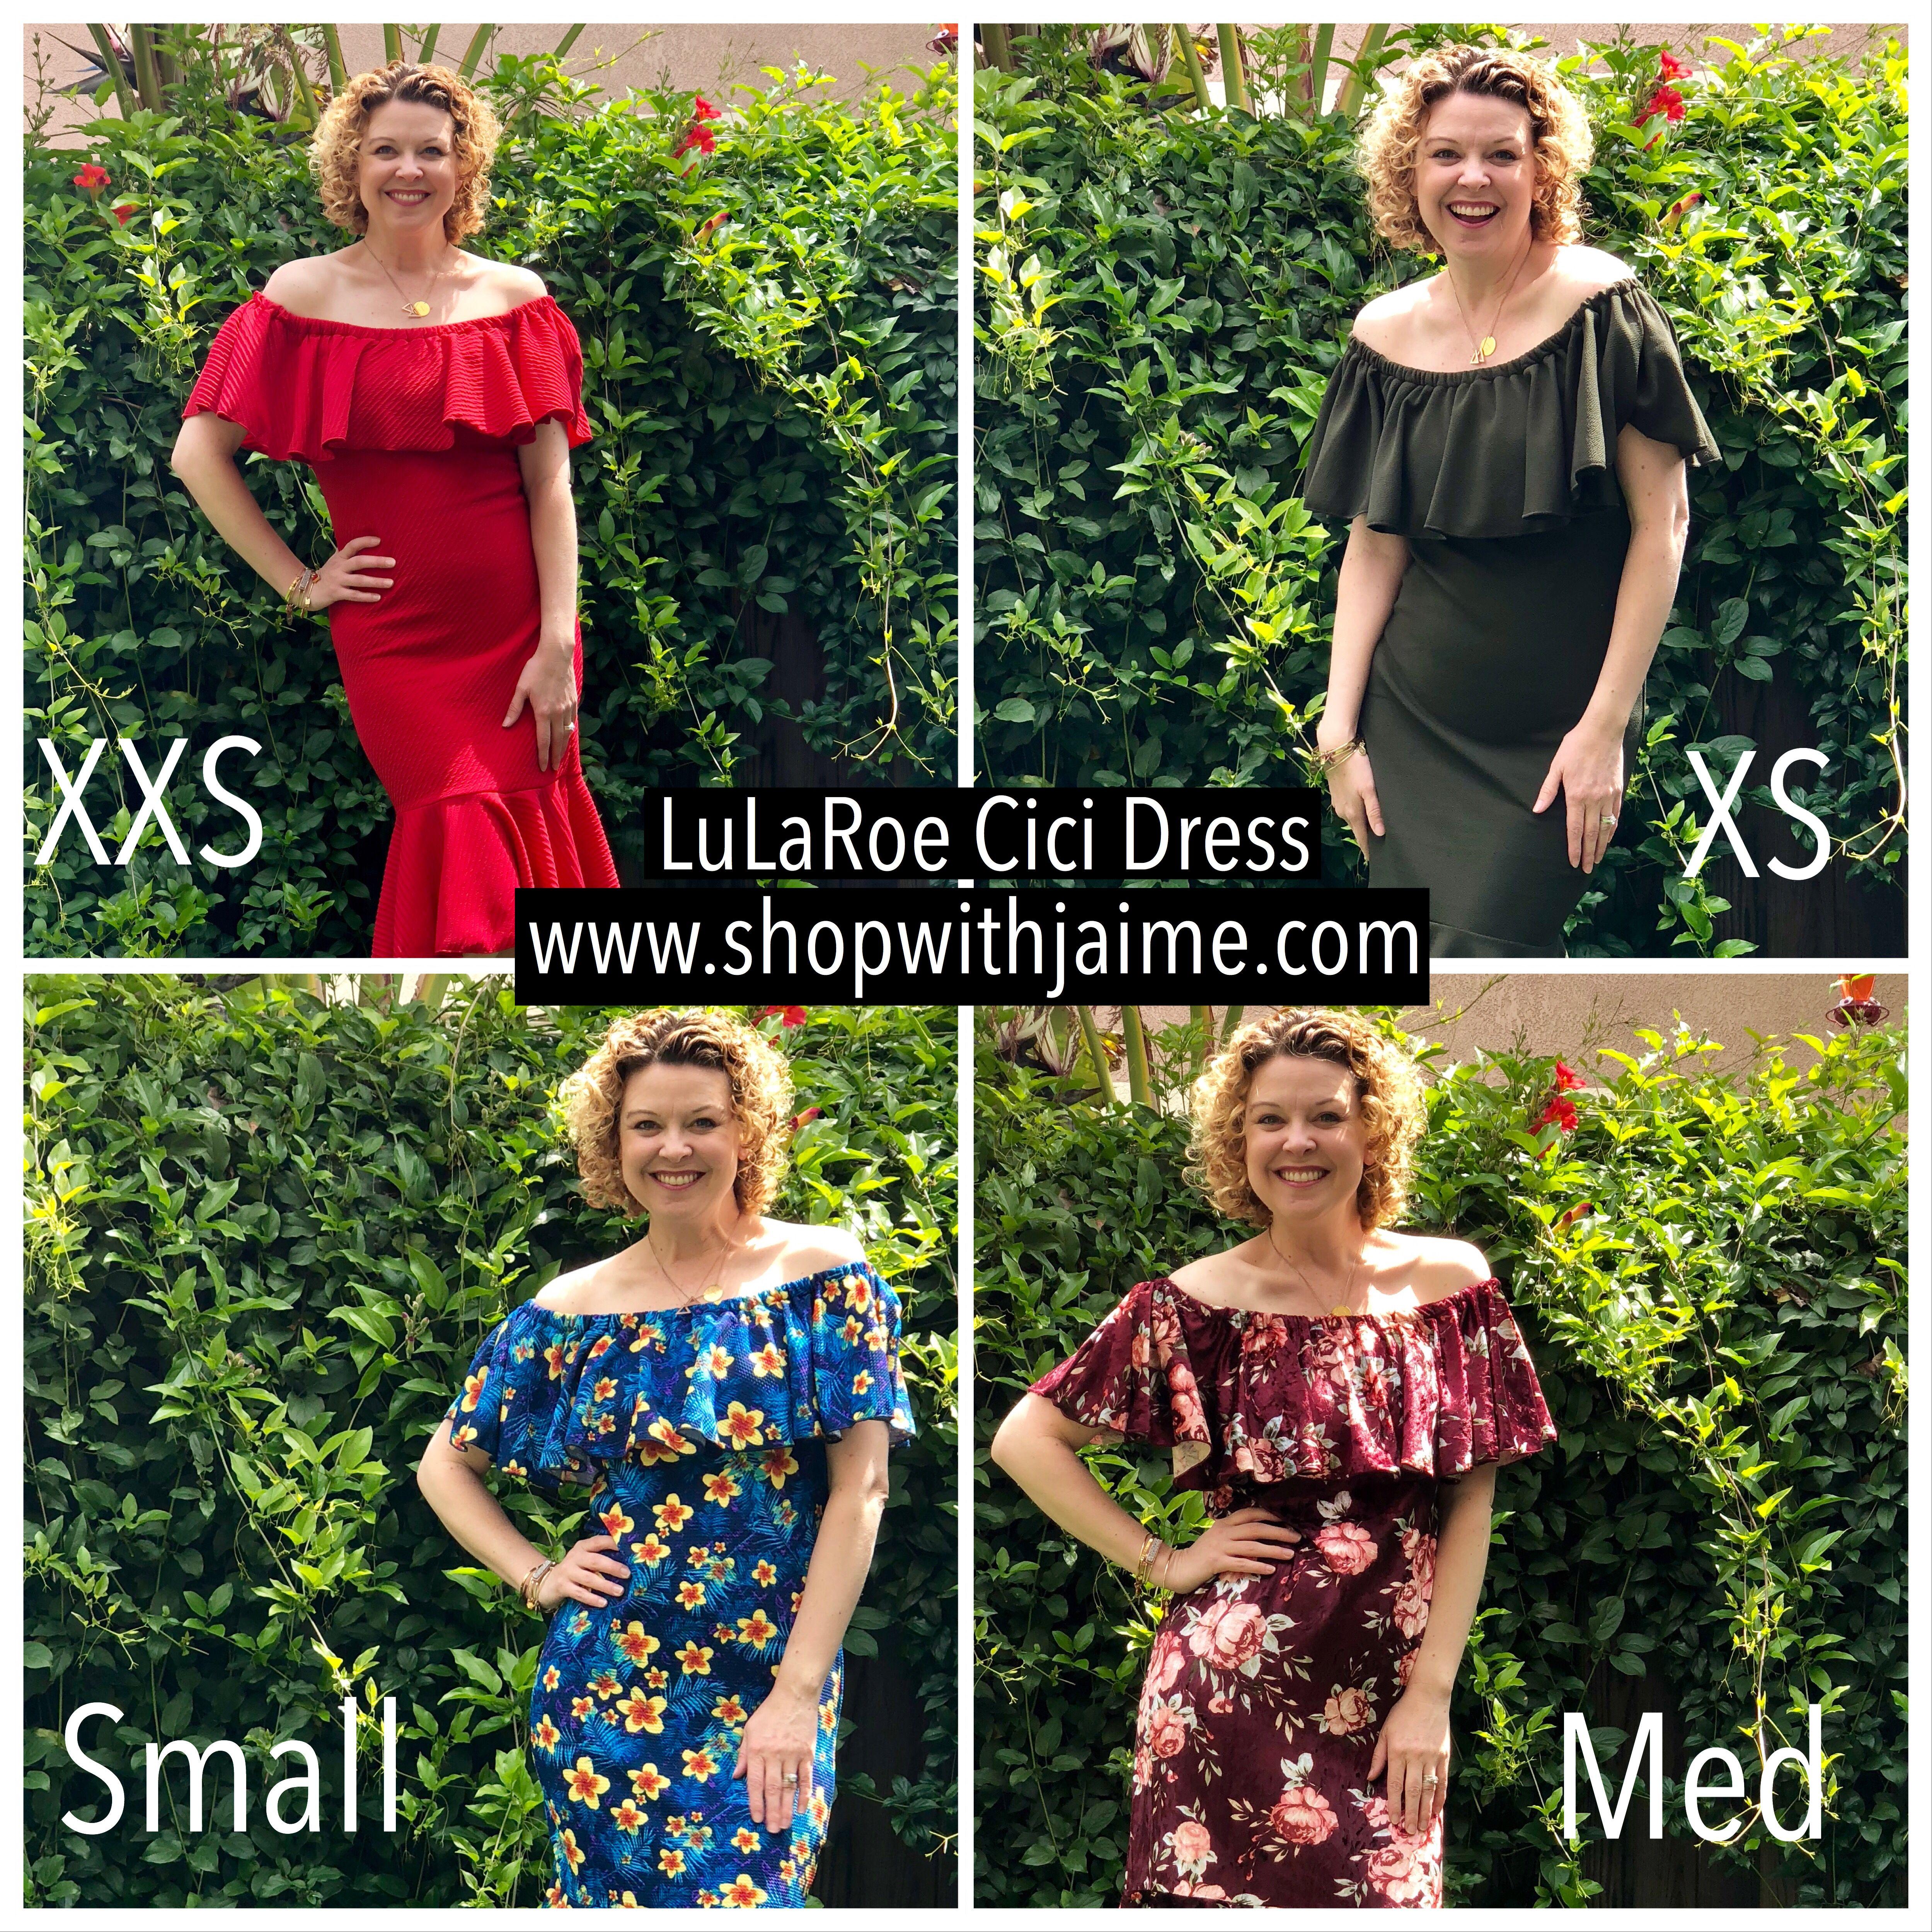 53a75d6762afa New LuLaRoe Cici Dress Sizing Chart